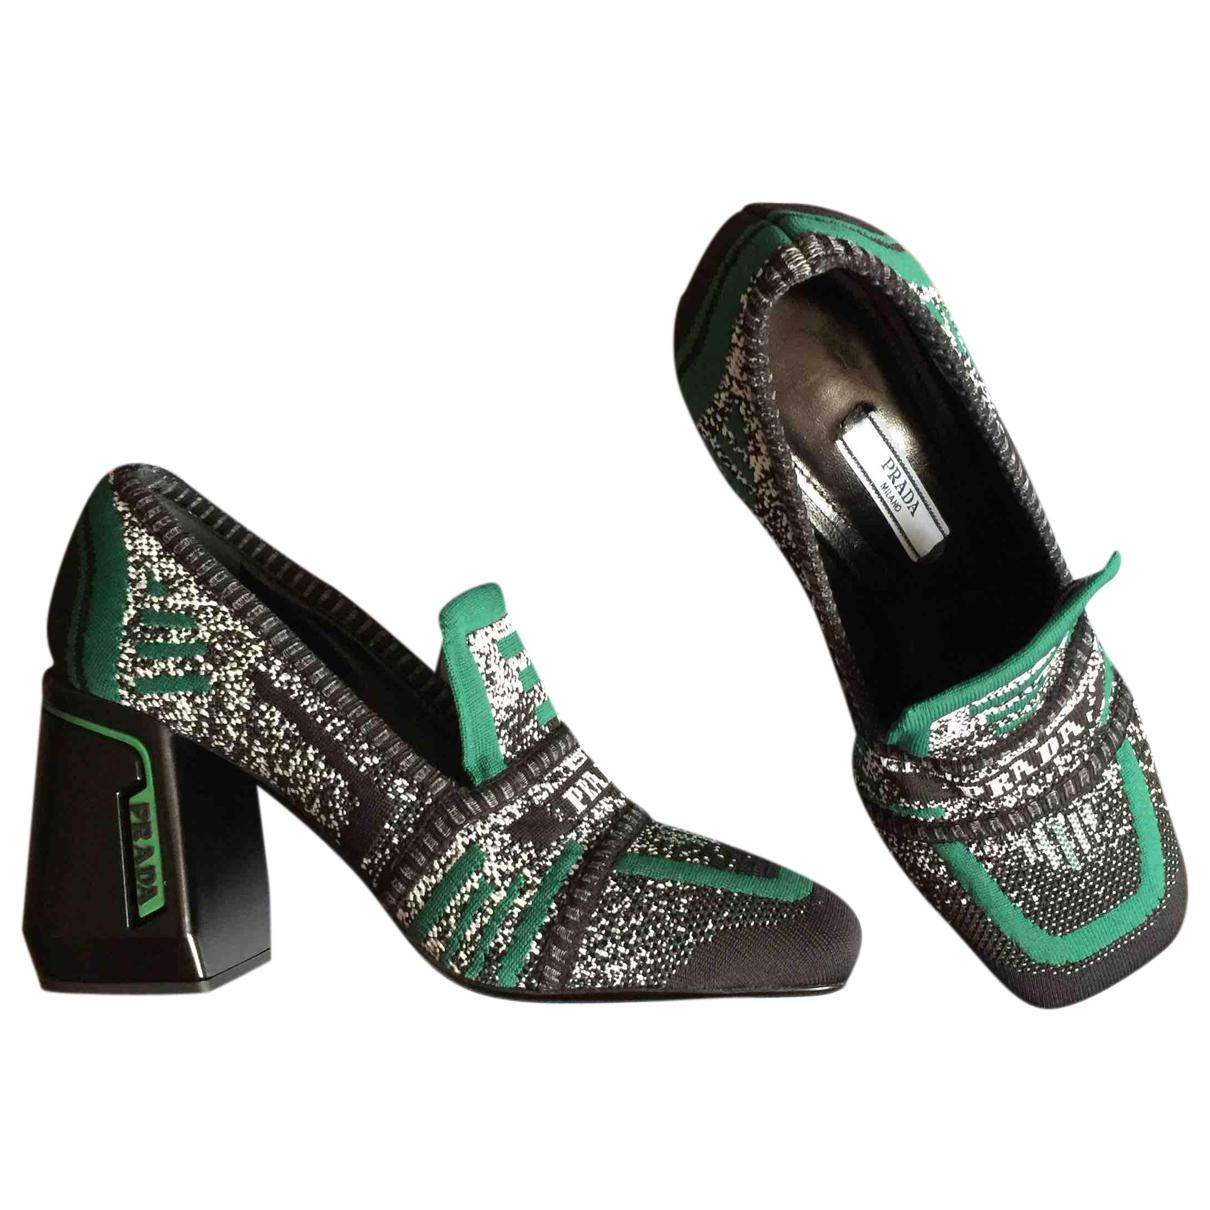 Prada N Multicolour Leather Heels for Women 37 EU